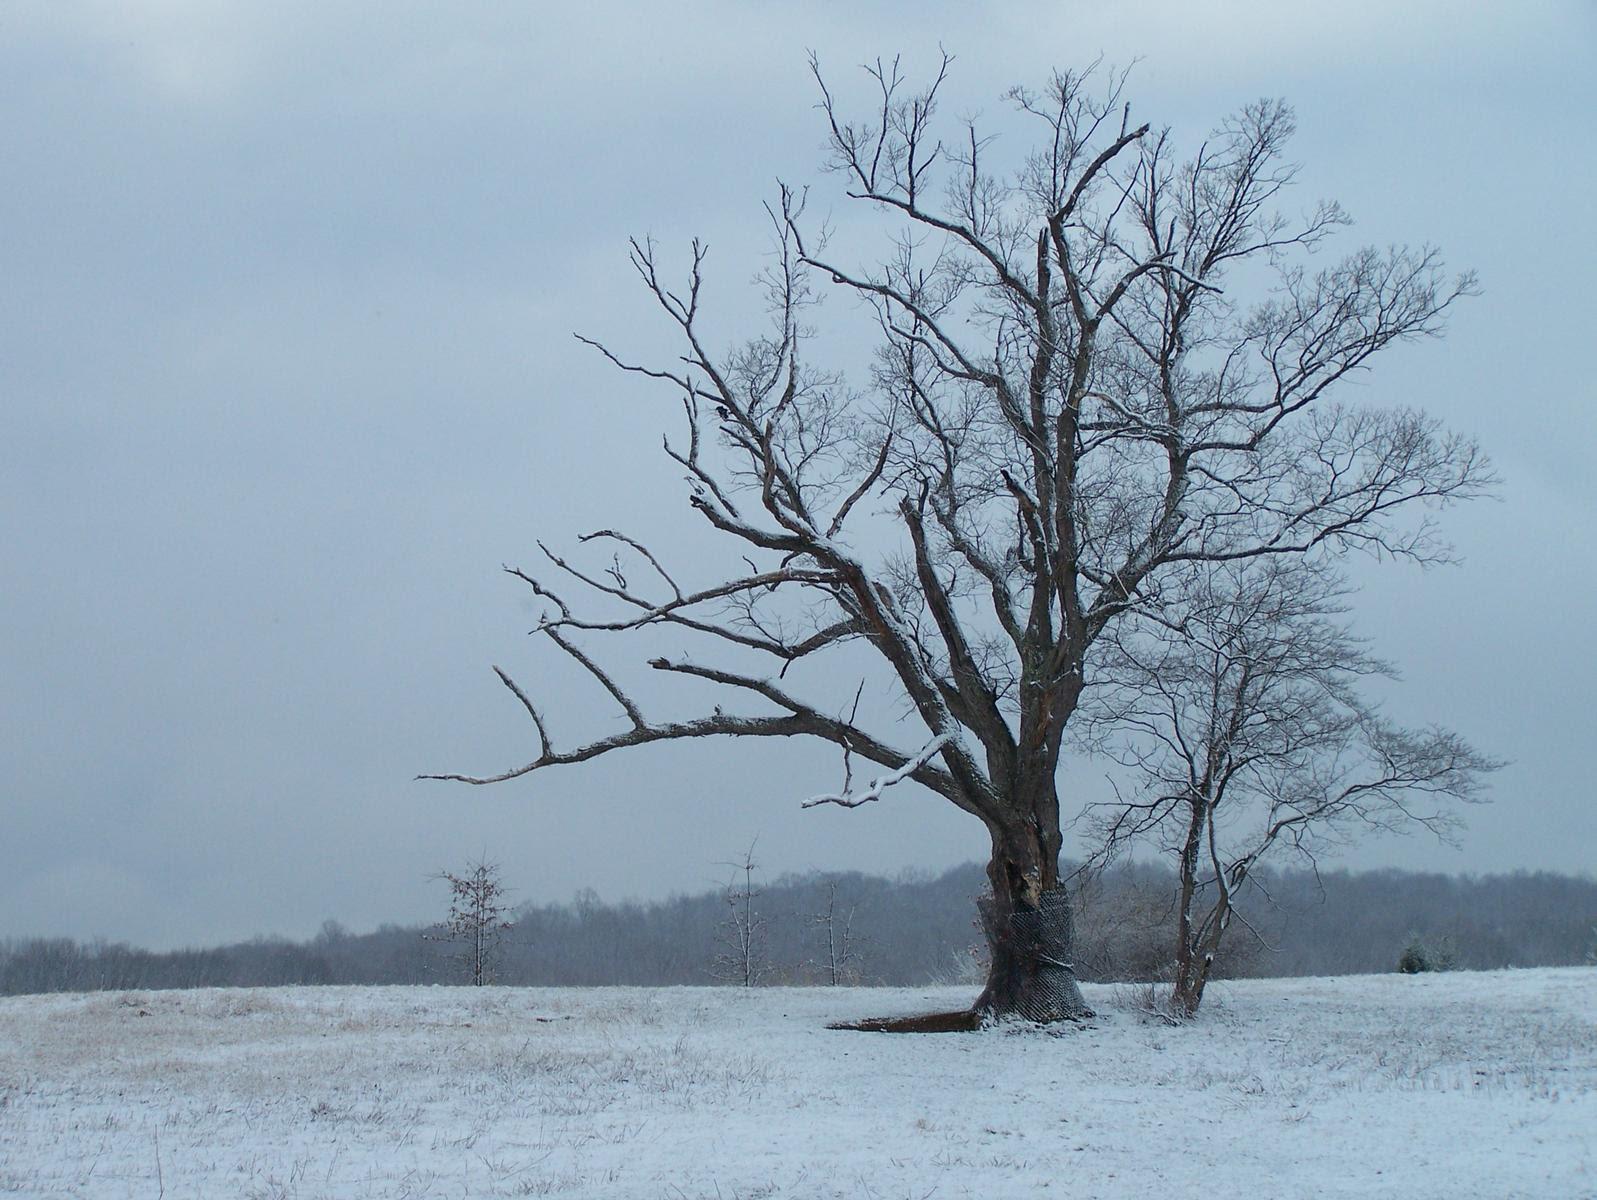 http://www.city-data.com/forum/attachments/photography/52484d1257694500-photos-trees-devils-tree.jpg